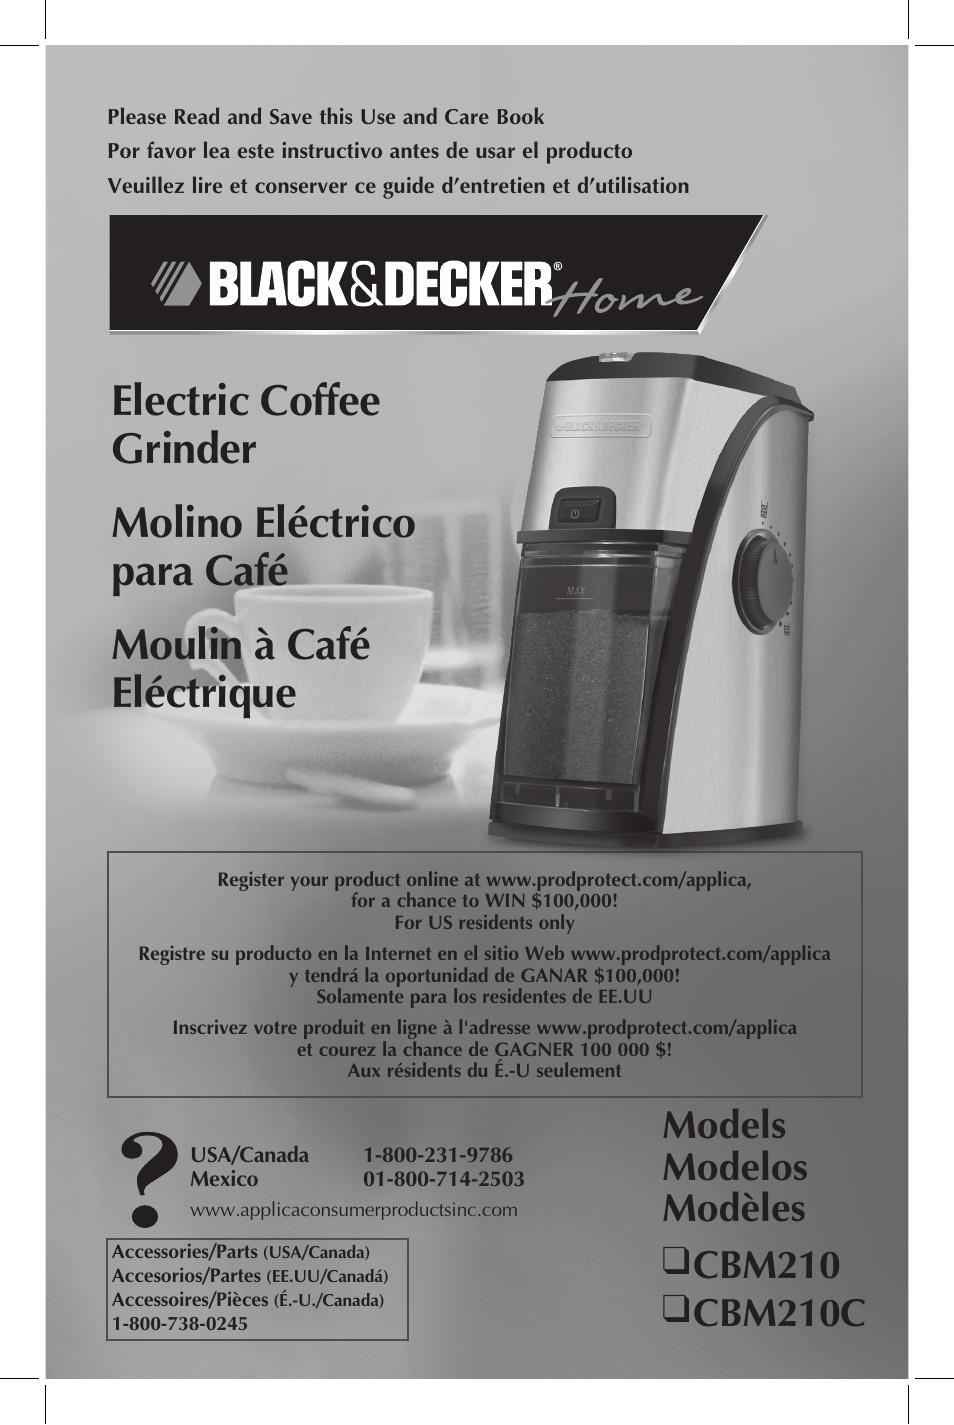 Coffee grinder black and decker black and decker coffee grinder.